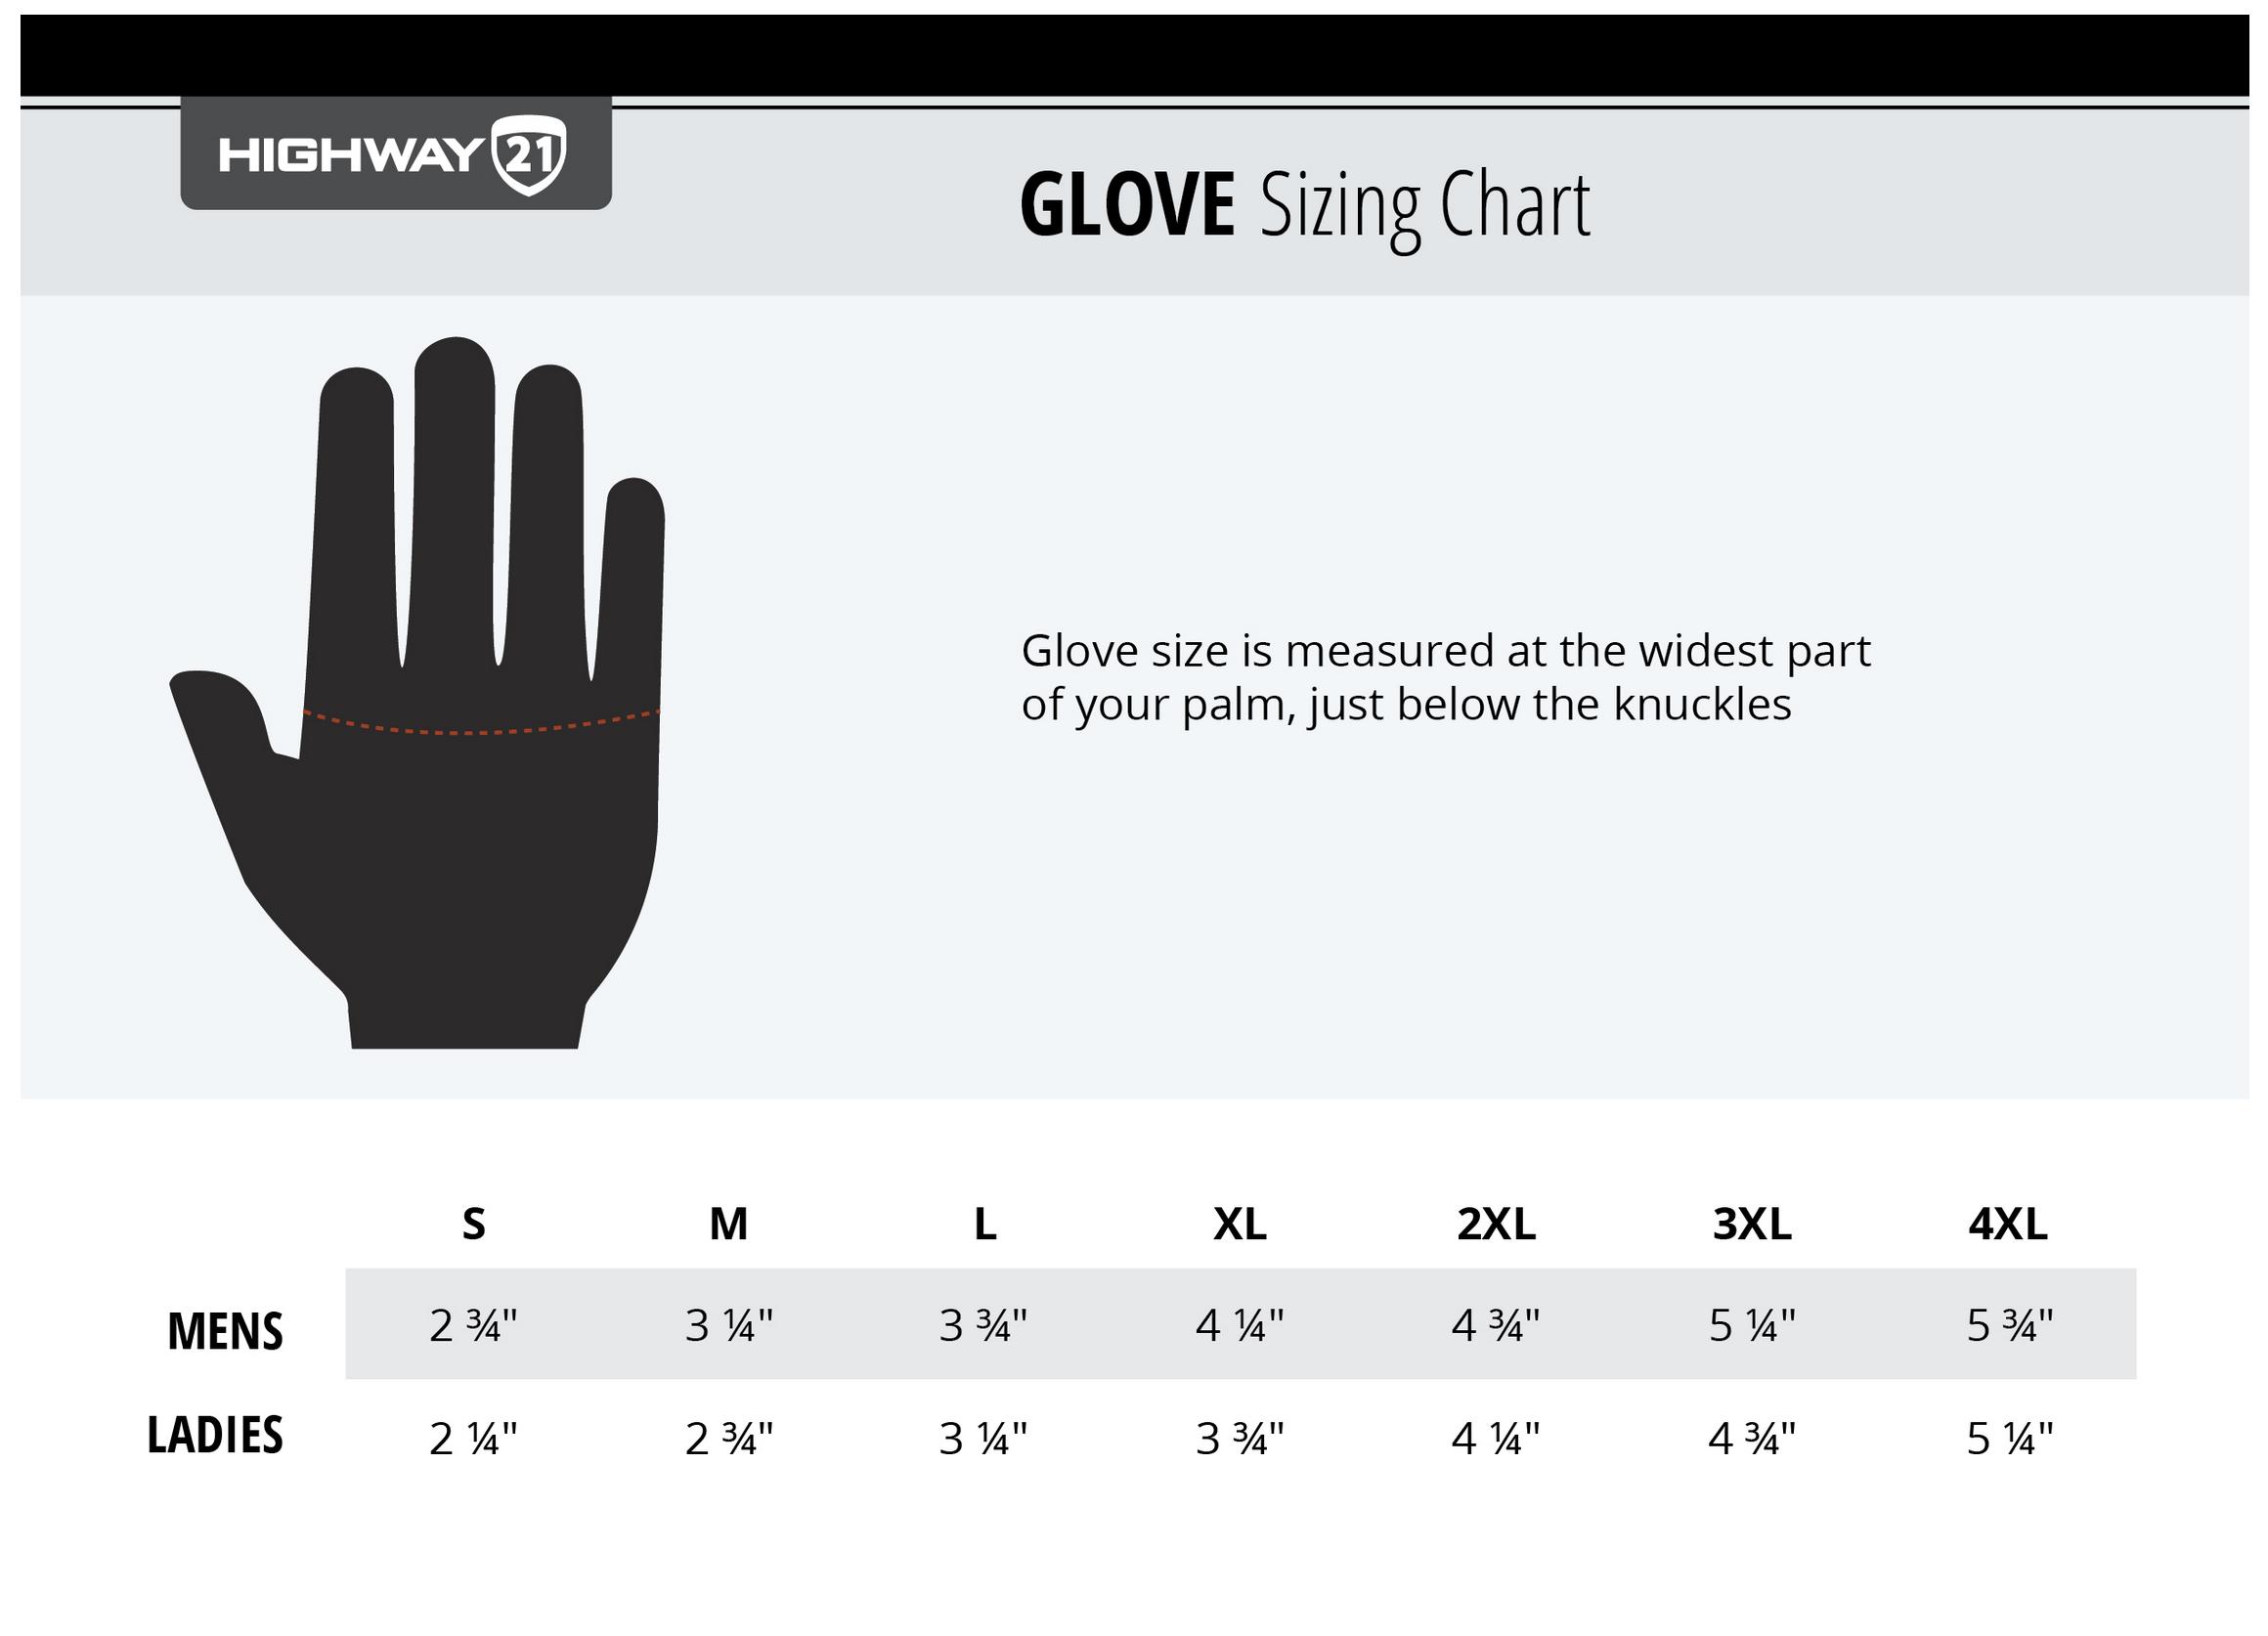 highway-21-size-chart-gloves.jpg